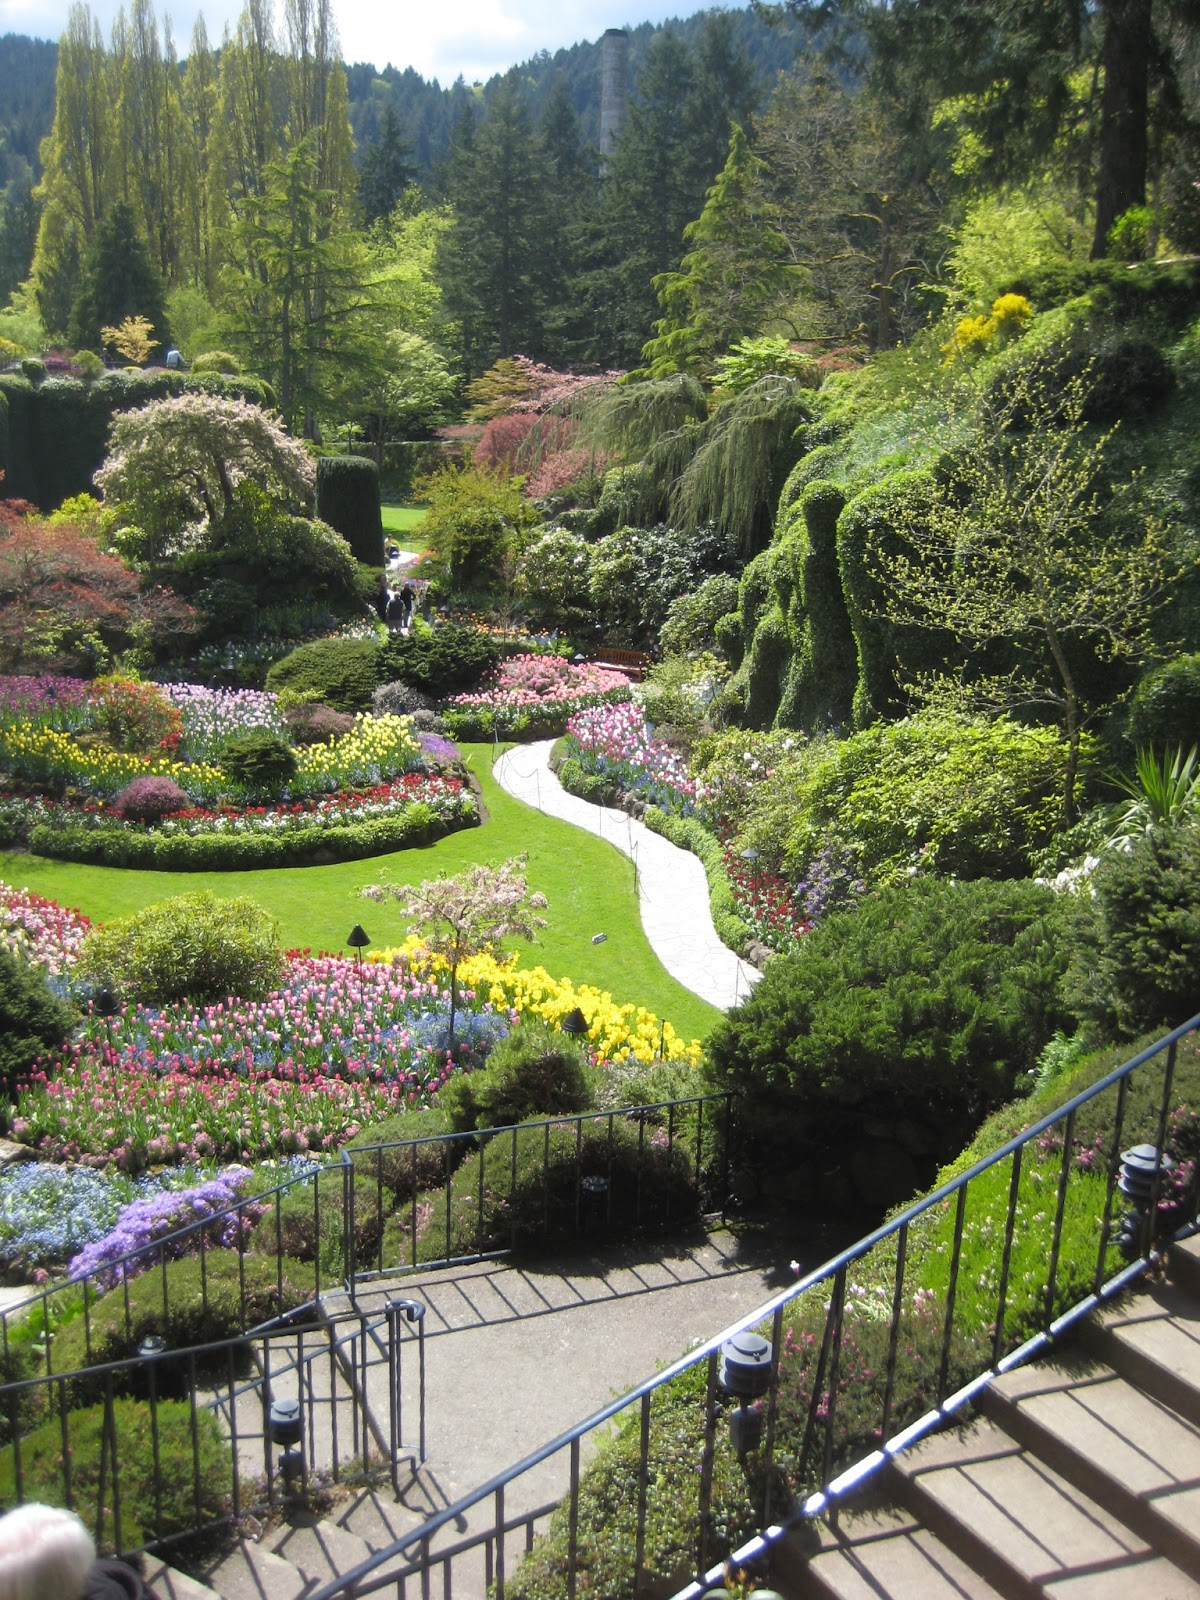 Victorian1885: Butchart Gardens April 2013